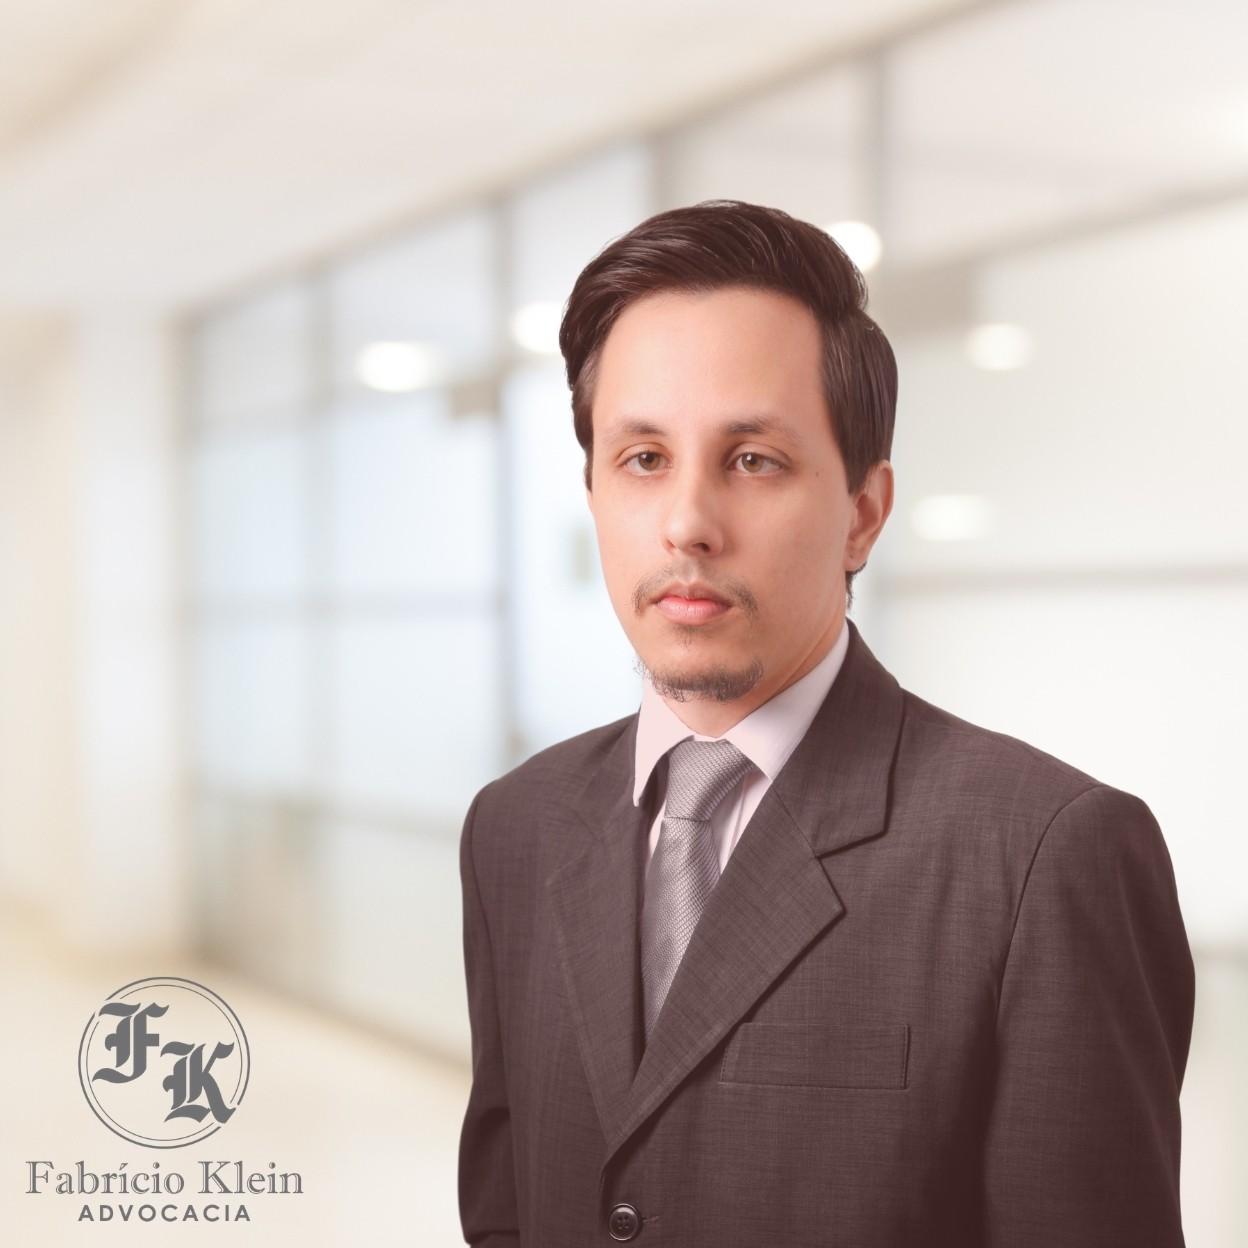 Advogado - OAB/DF 53.443